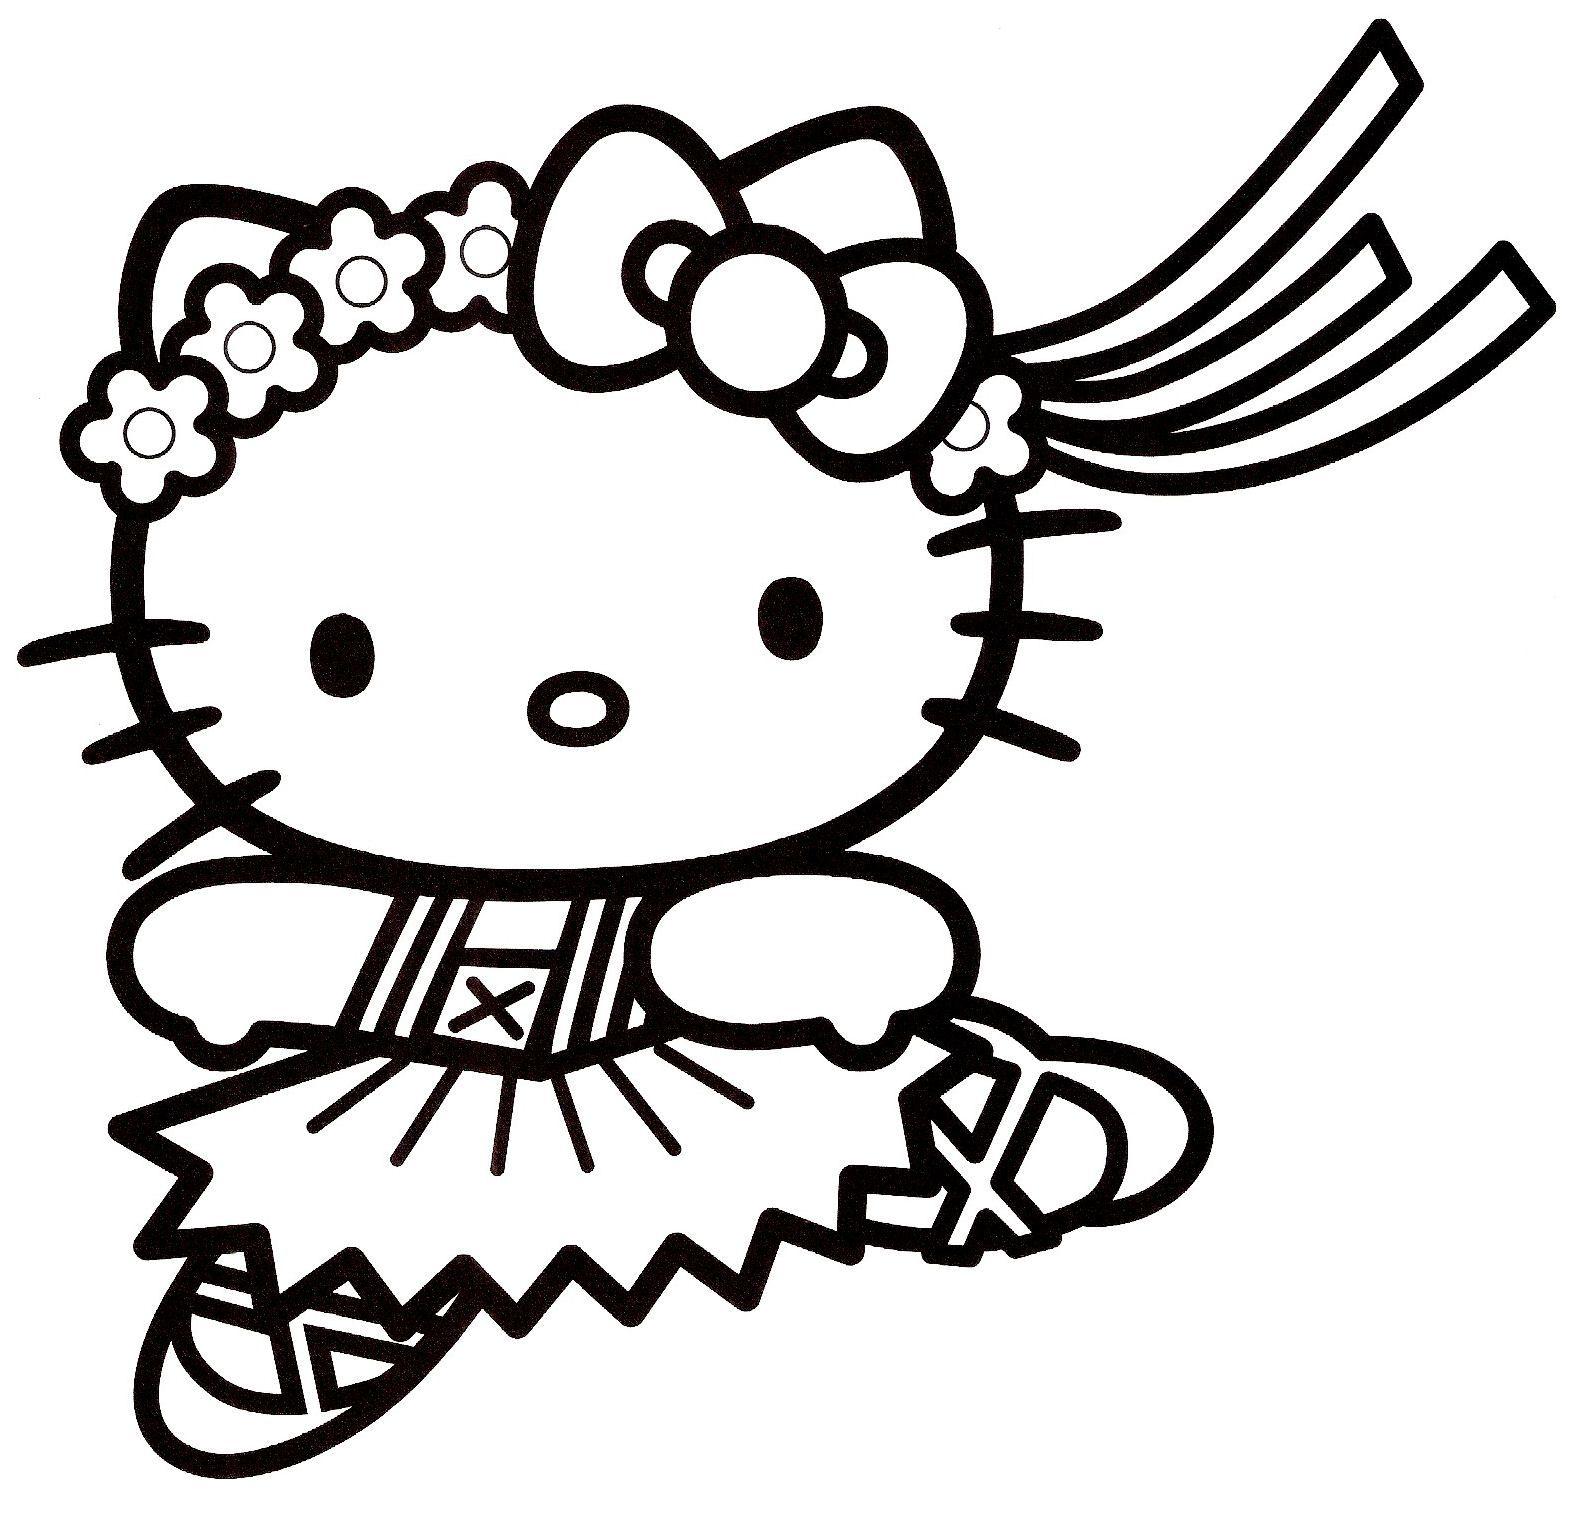 Hello Kitty Love Ausmalbilder : Coloriage Hello Kitty Colorier Dessin Imprimer Taylor